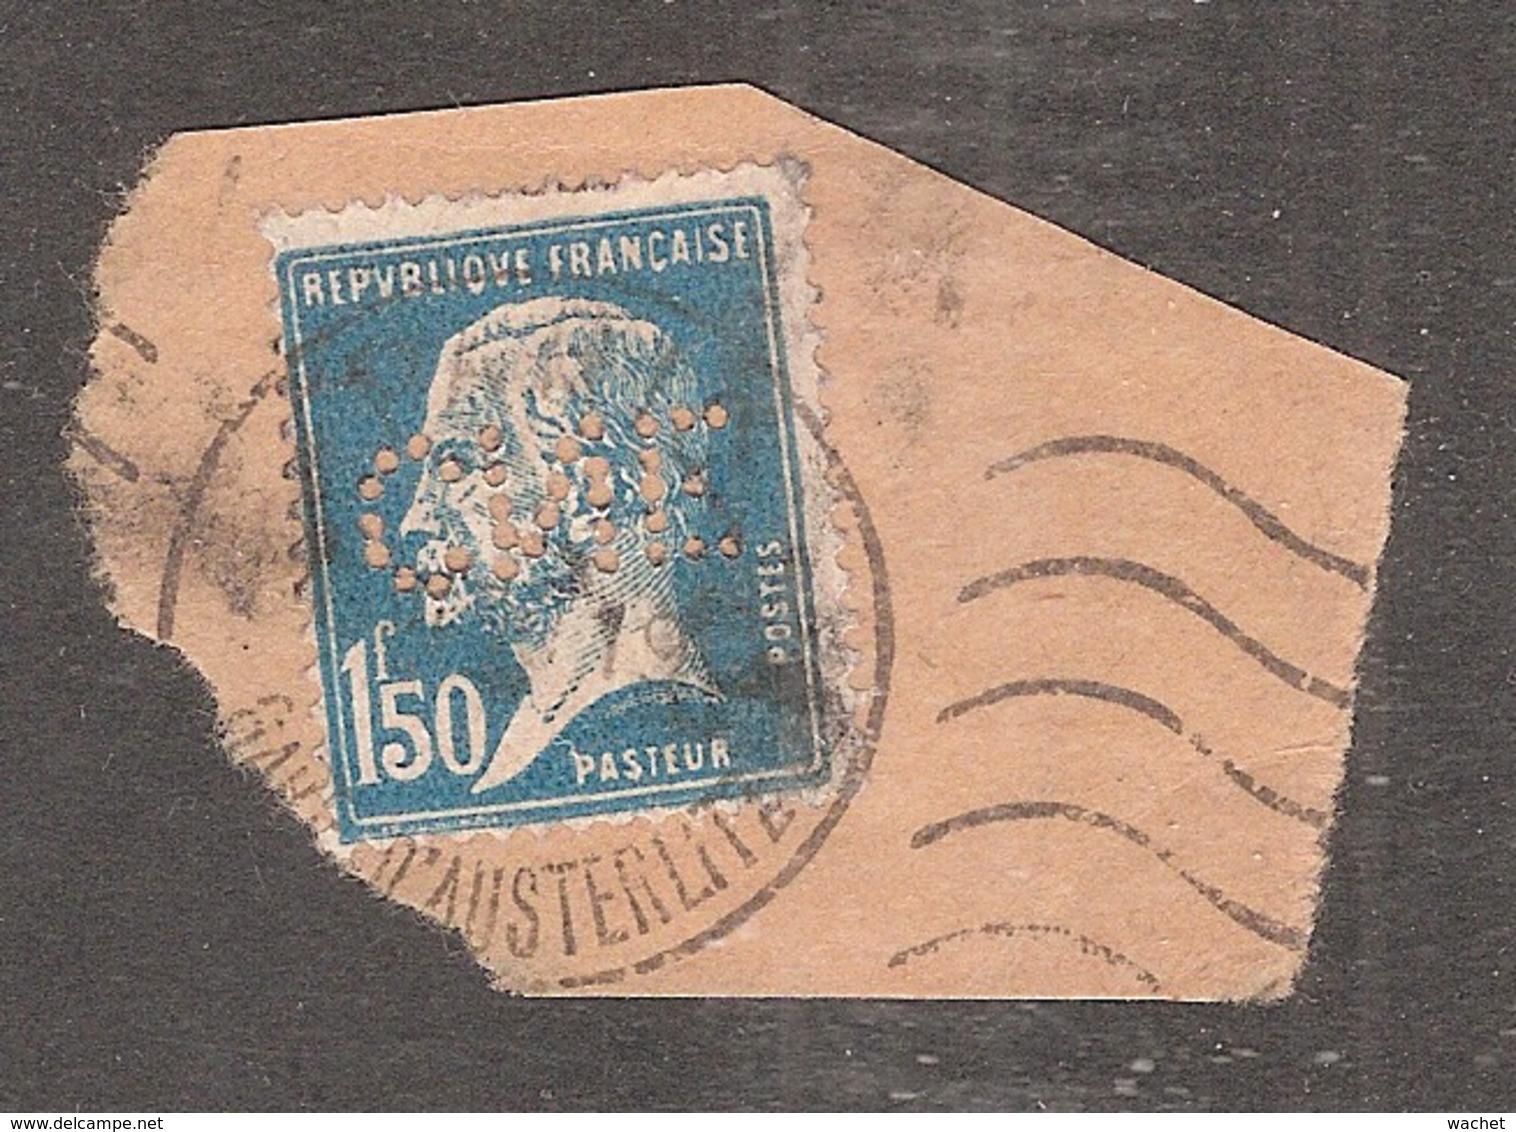 Perforé/perfin/lochung France No 181 CNE  Comptoir National D'Escompte (310) - France